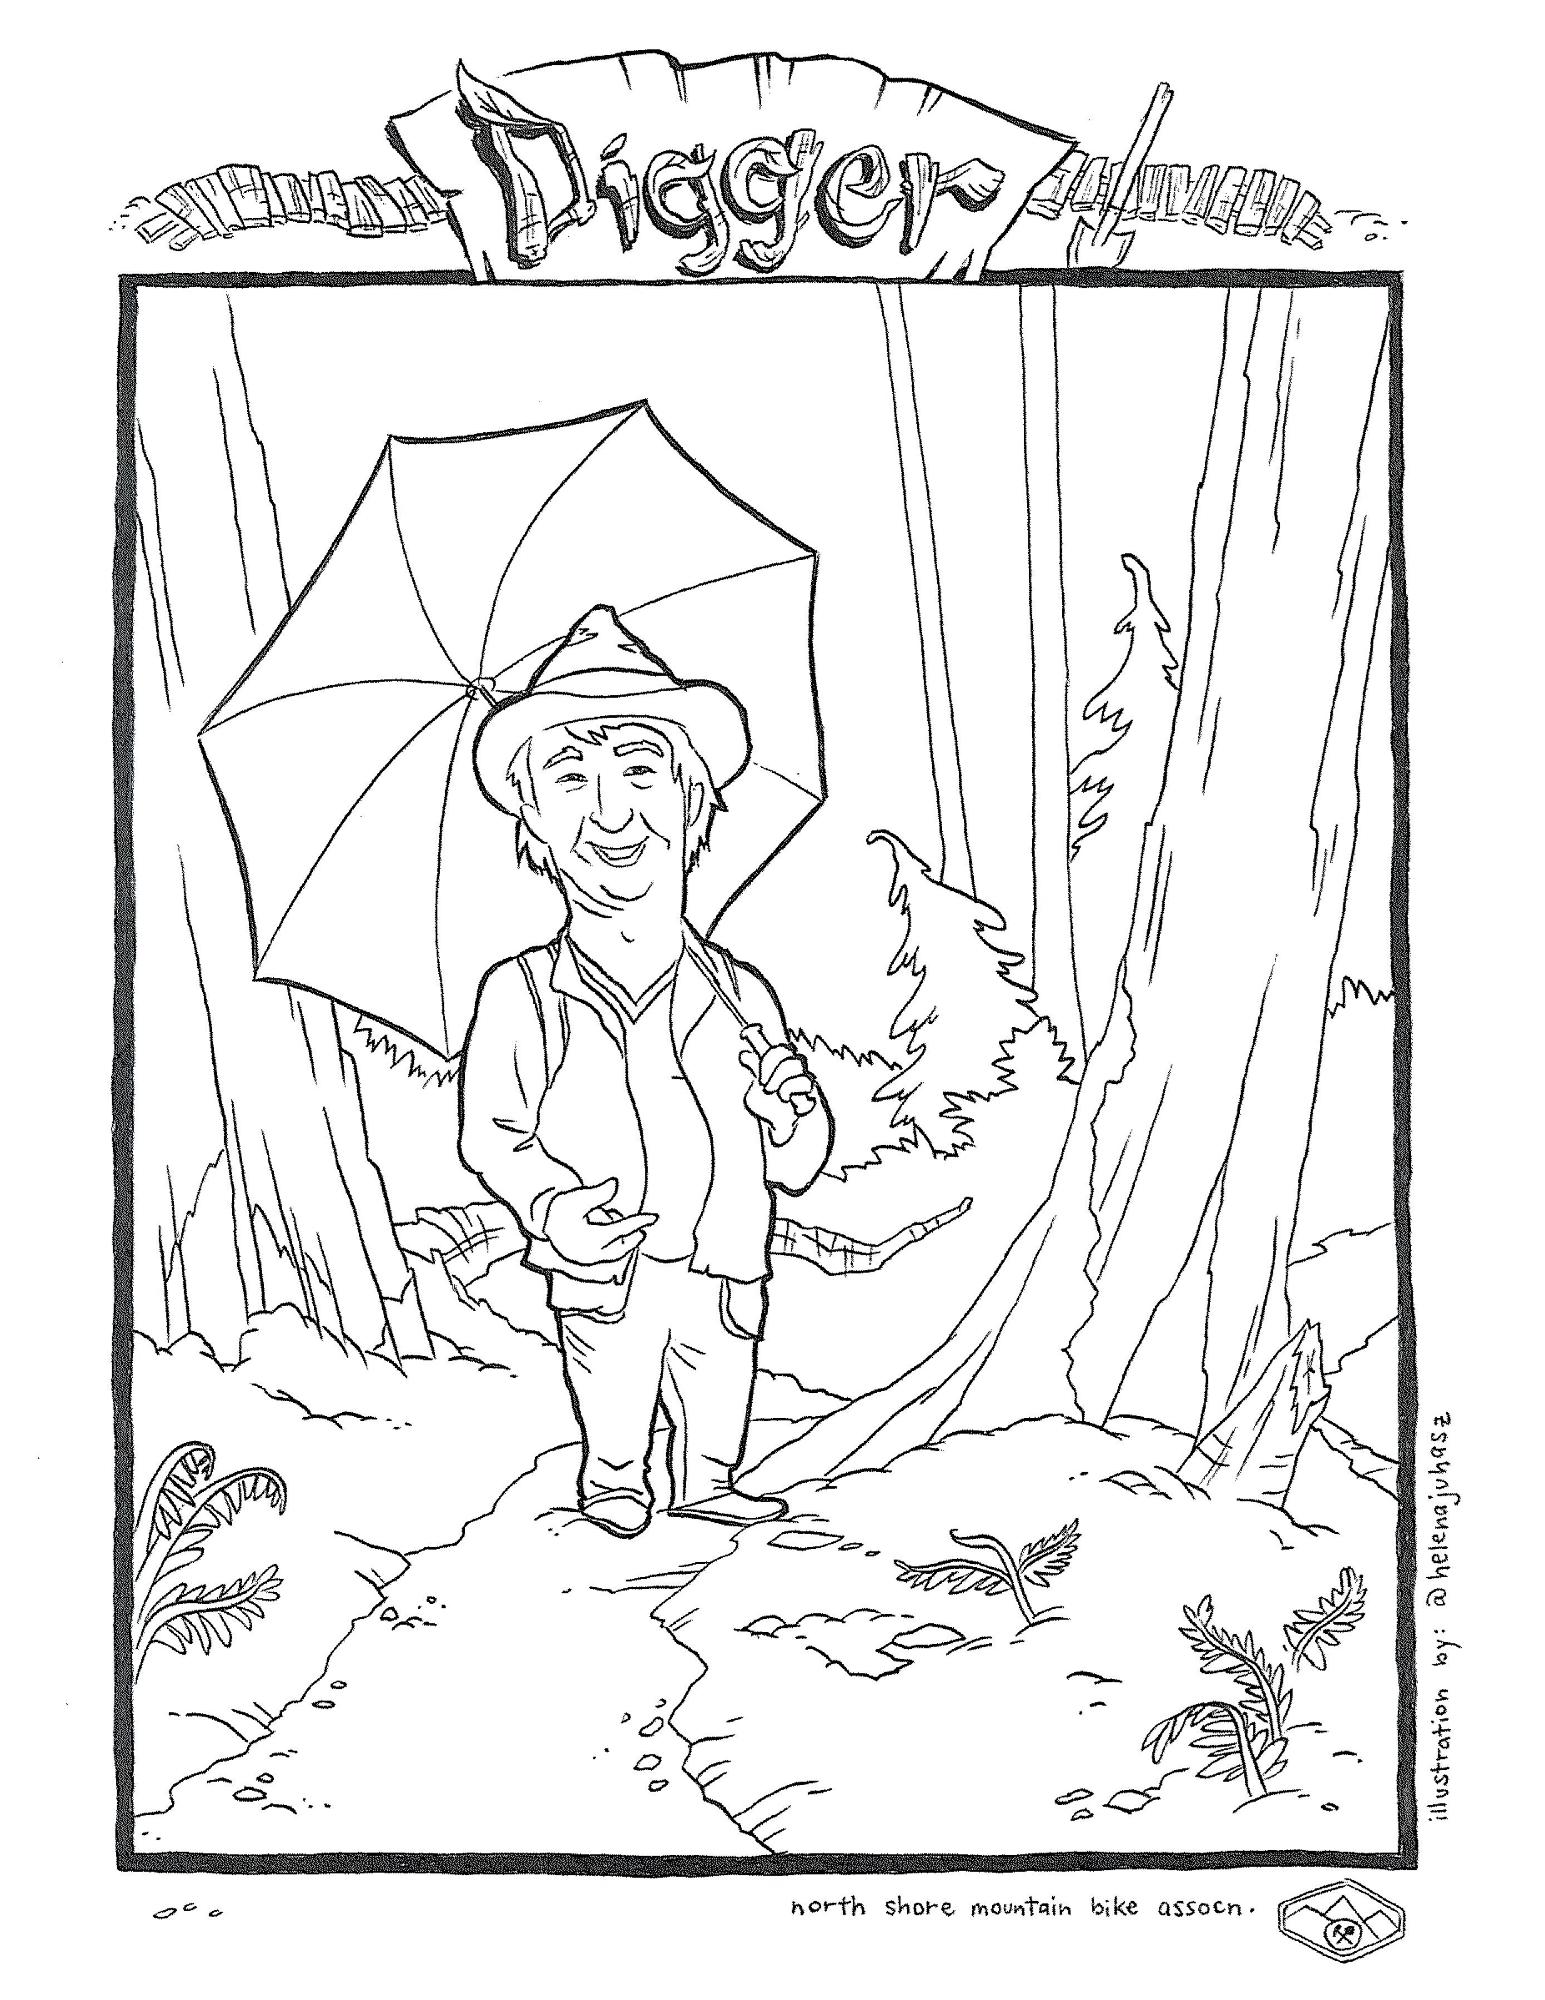 British Columbia Coloring Doodle Page | Social studies, Preschool ... | 2000x1545